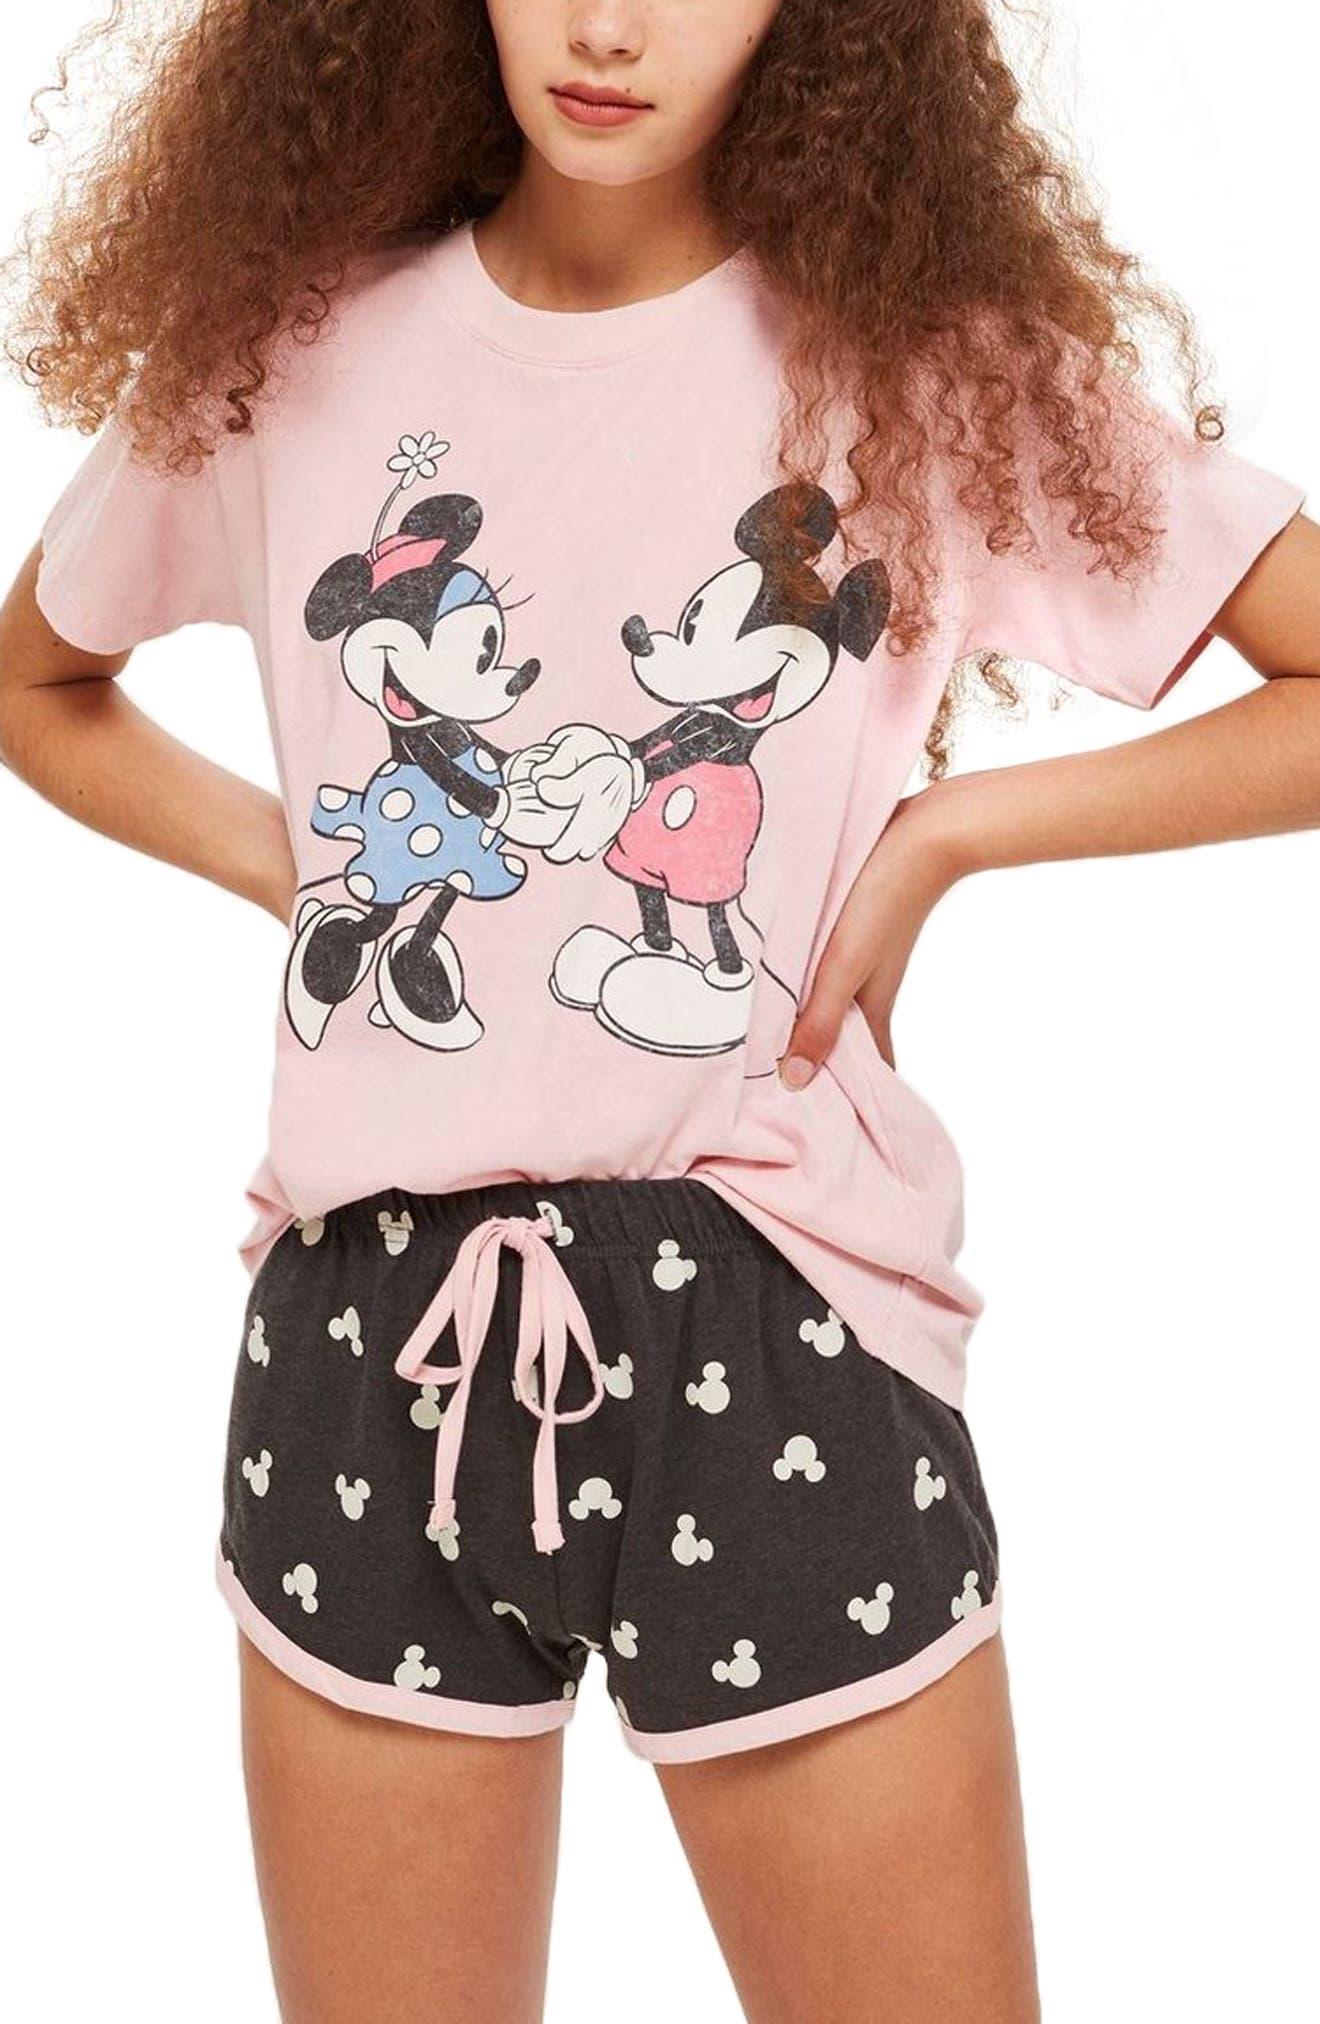 Minnie & Mickey Short Pajamas,                             Main thumbnail 1, color,                             DUSTY PINK MULTI